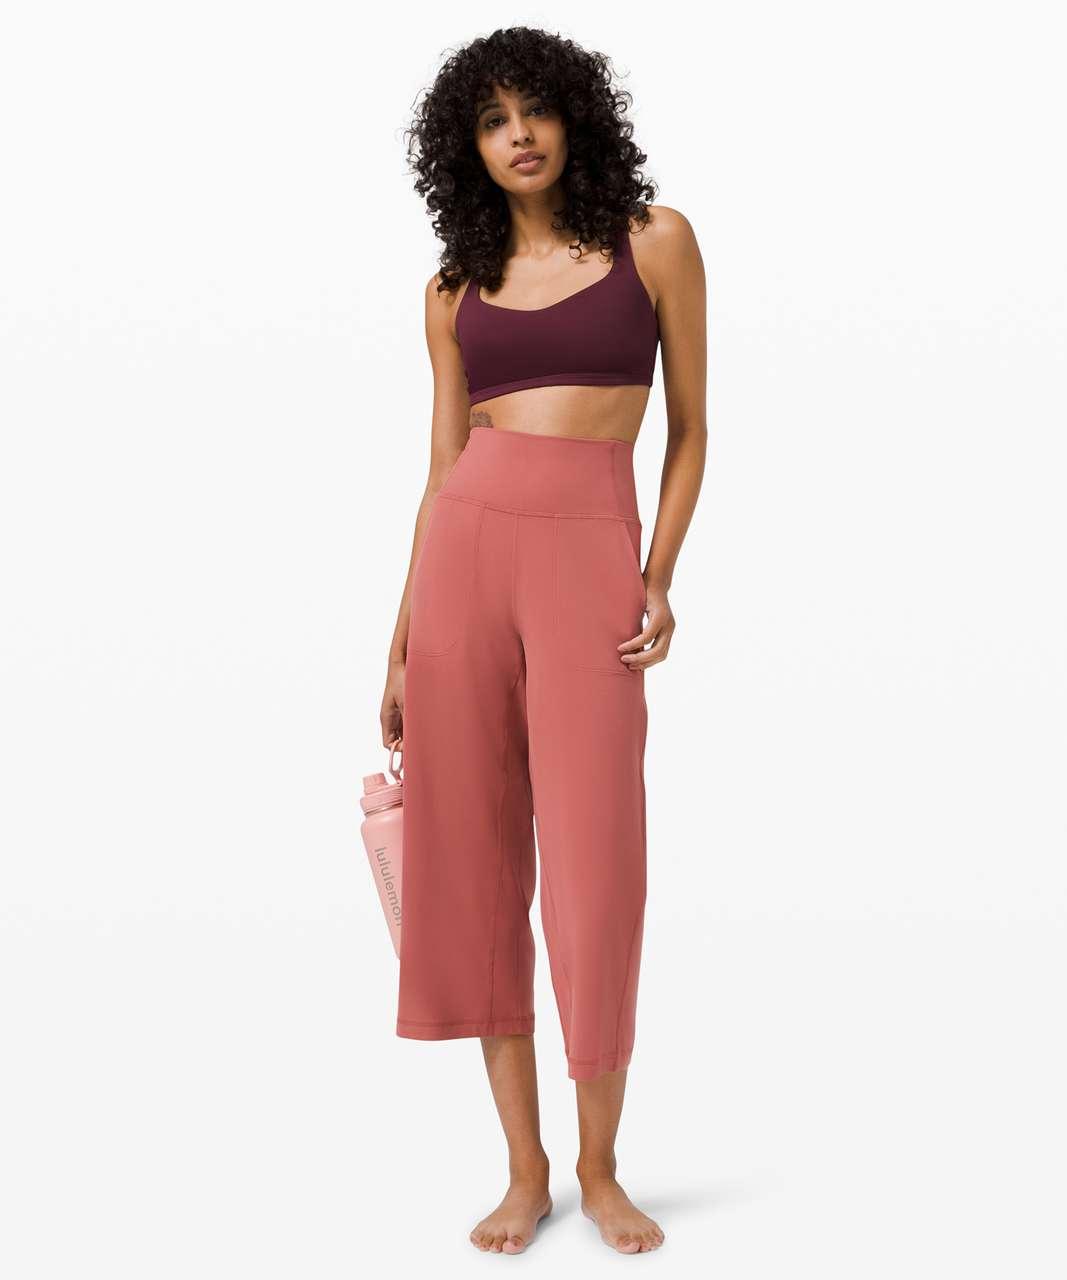 "Lululemon Align Wide Leg Crop 23"" - Soft Cranberry"